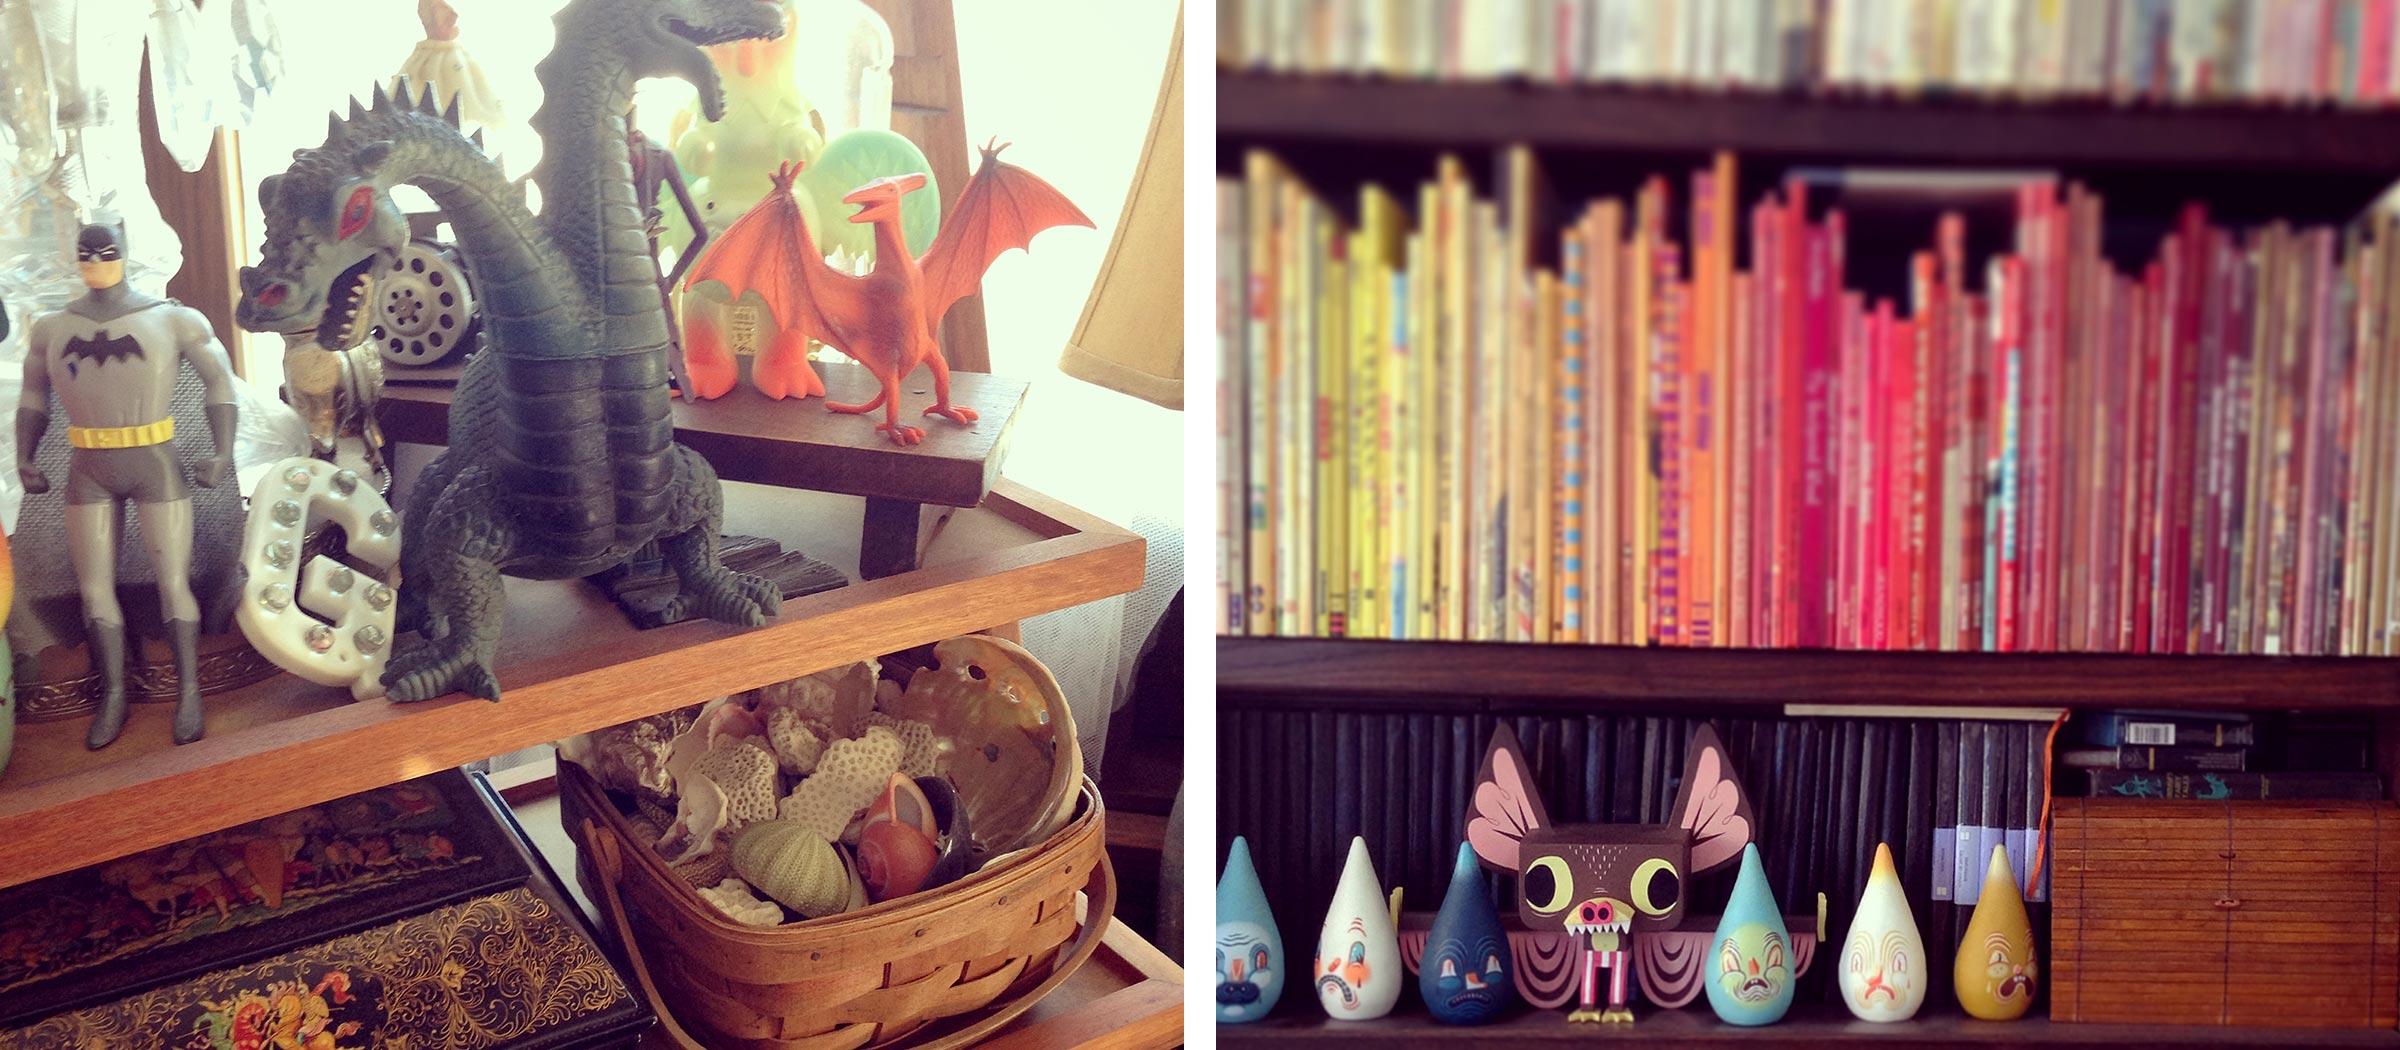 Pivot-Blog-Mab-Graves-Alice-In-Wonderland-Collage-02